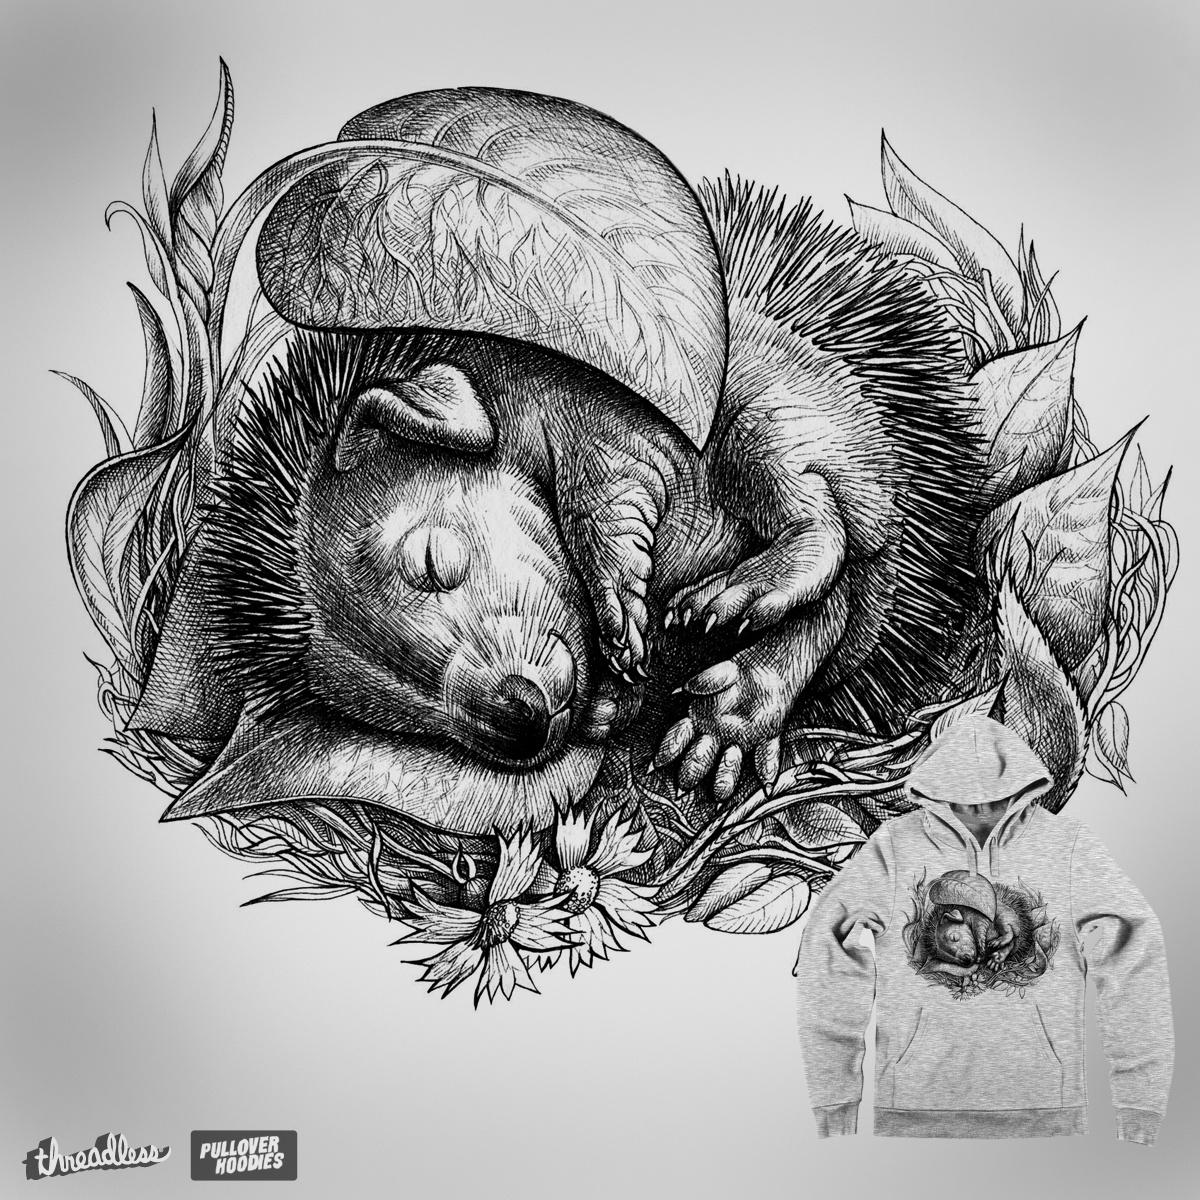 Baby hedgehog. by Elina_Ch on Threadless